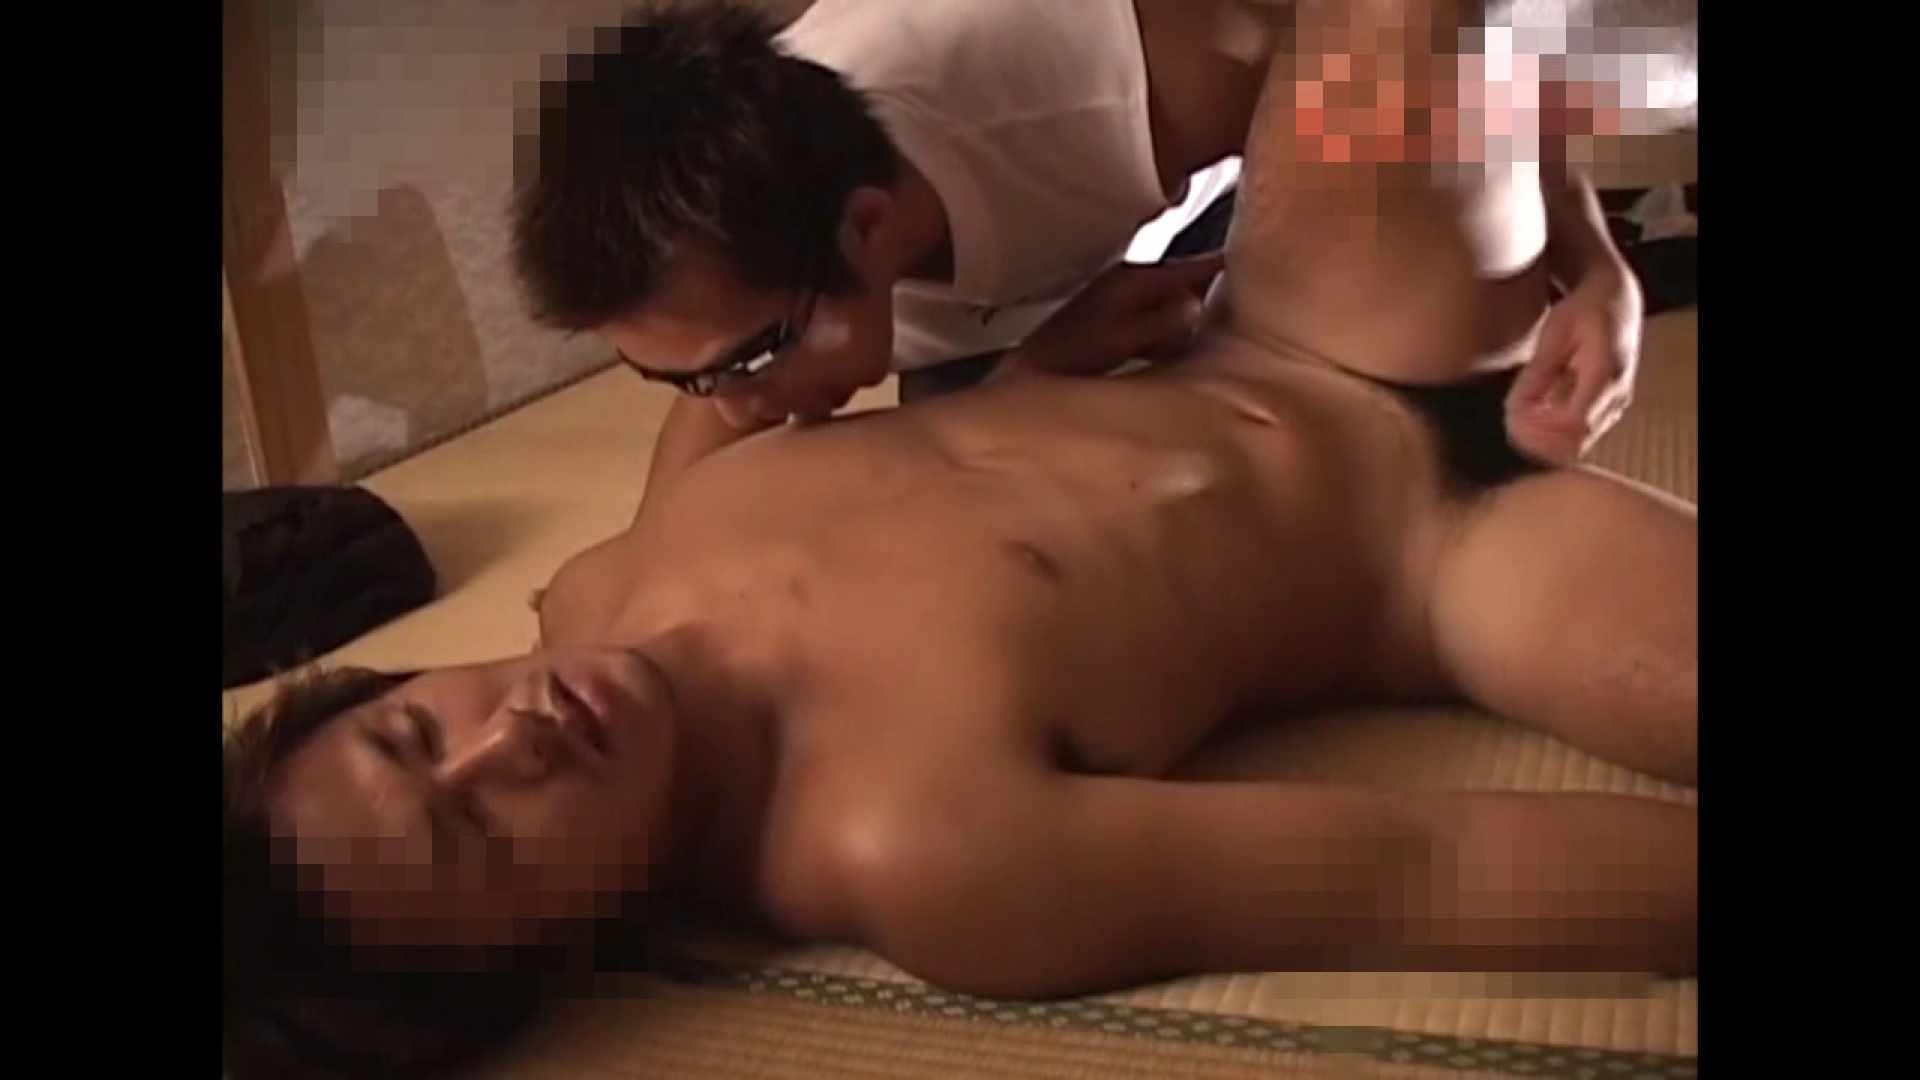 Beautiful muscle モッコリ野郎達!Vol.10 ゲイのアナル 尻マンコ画像 39連発 36